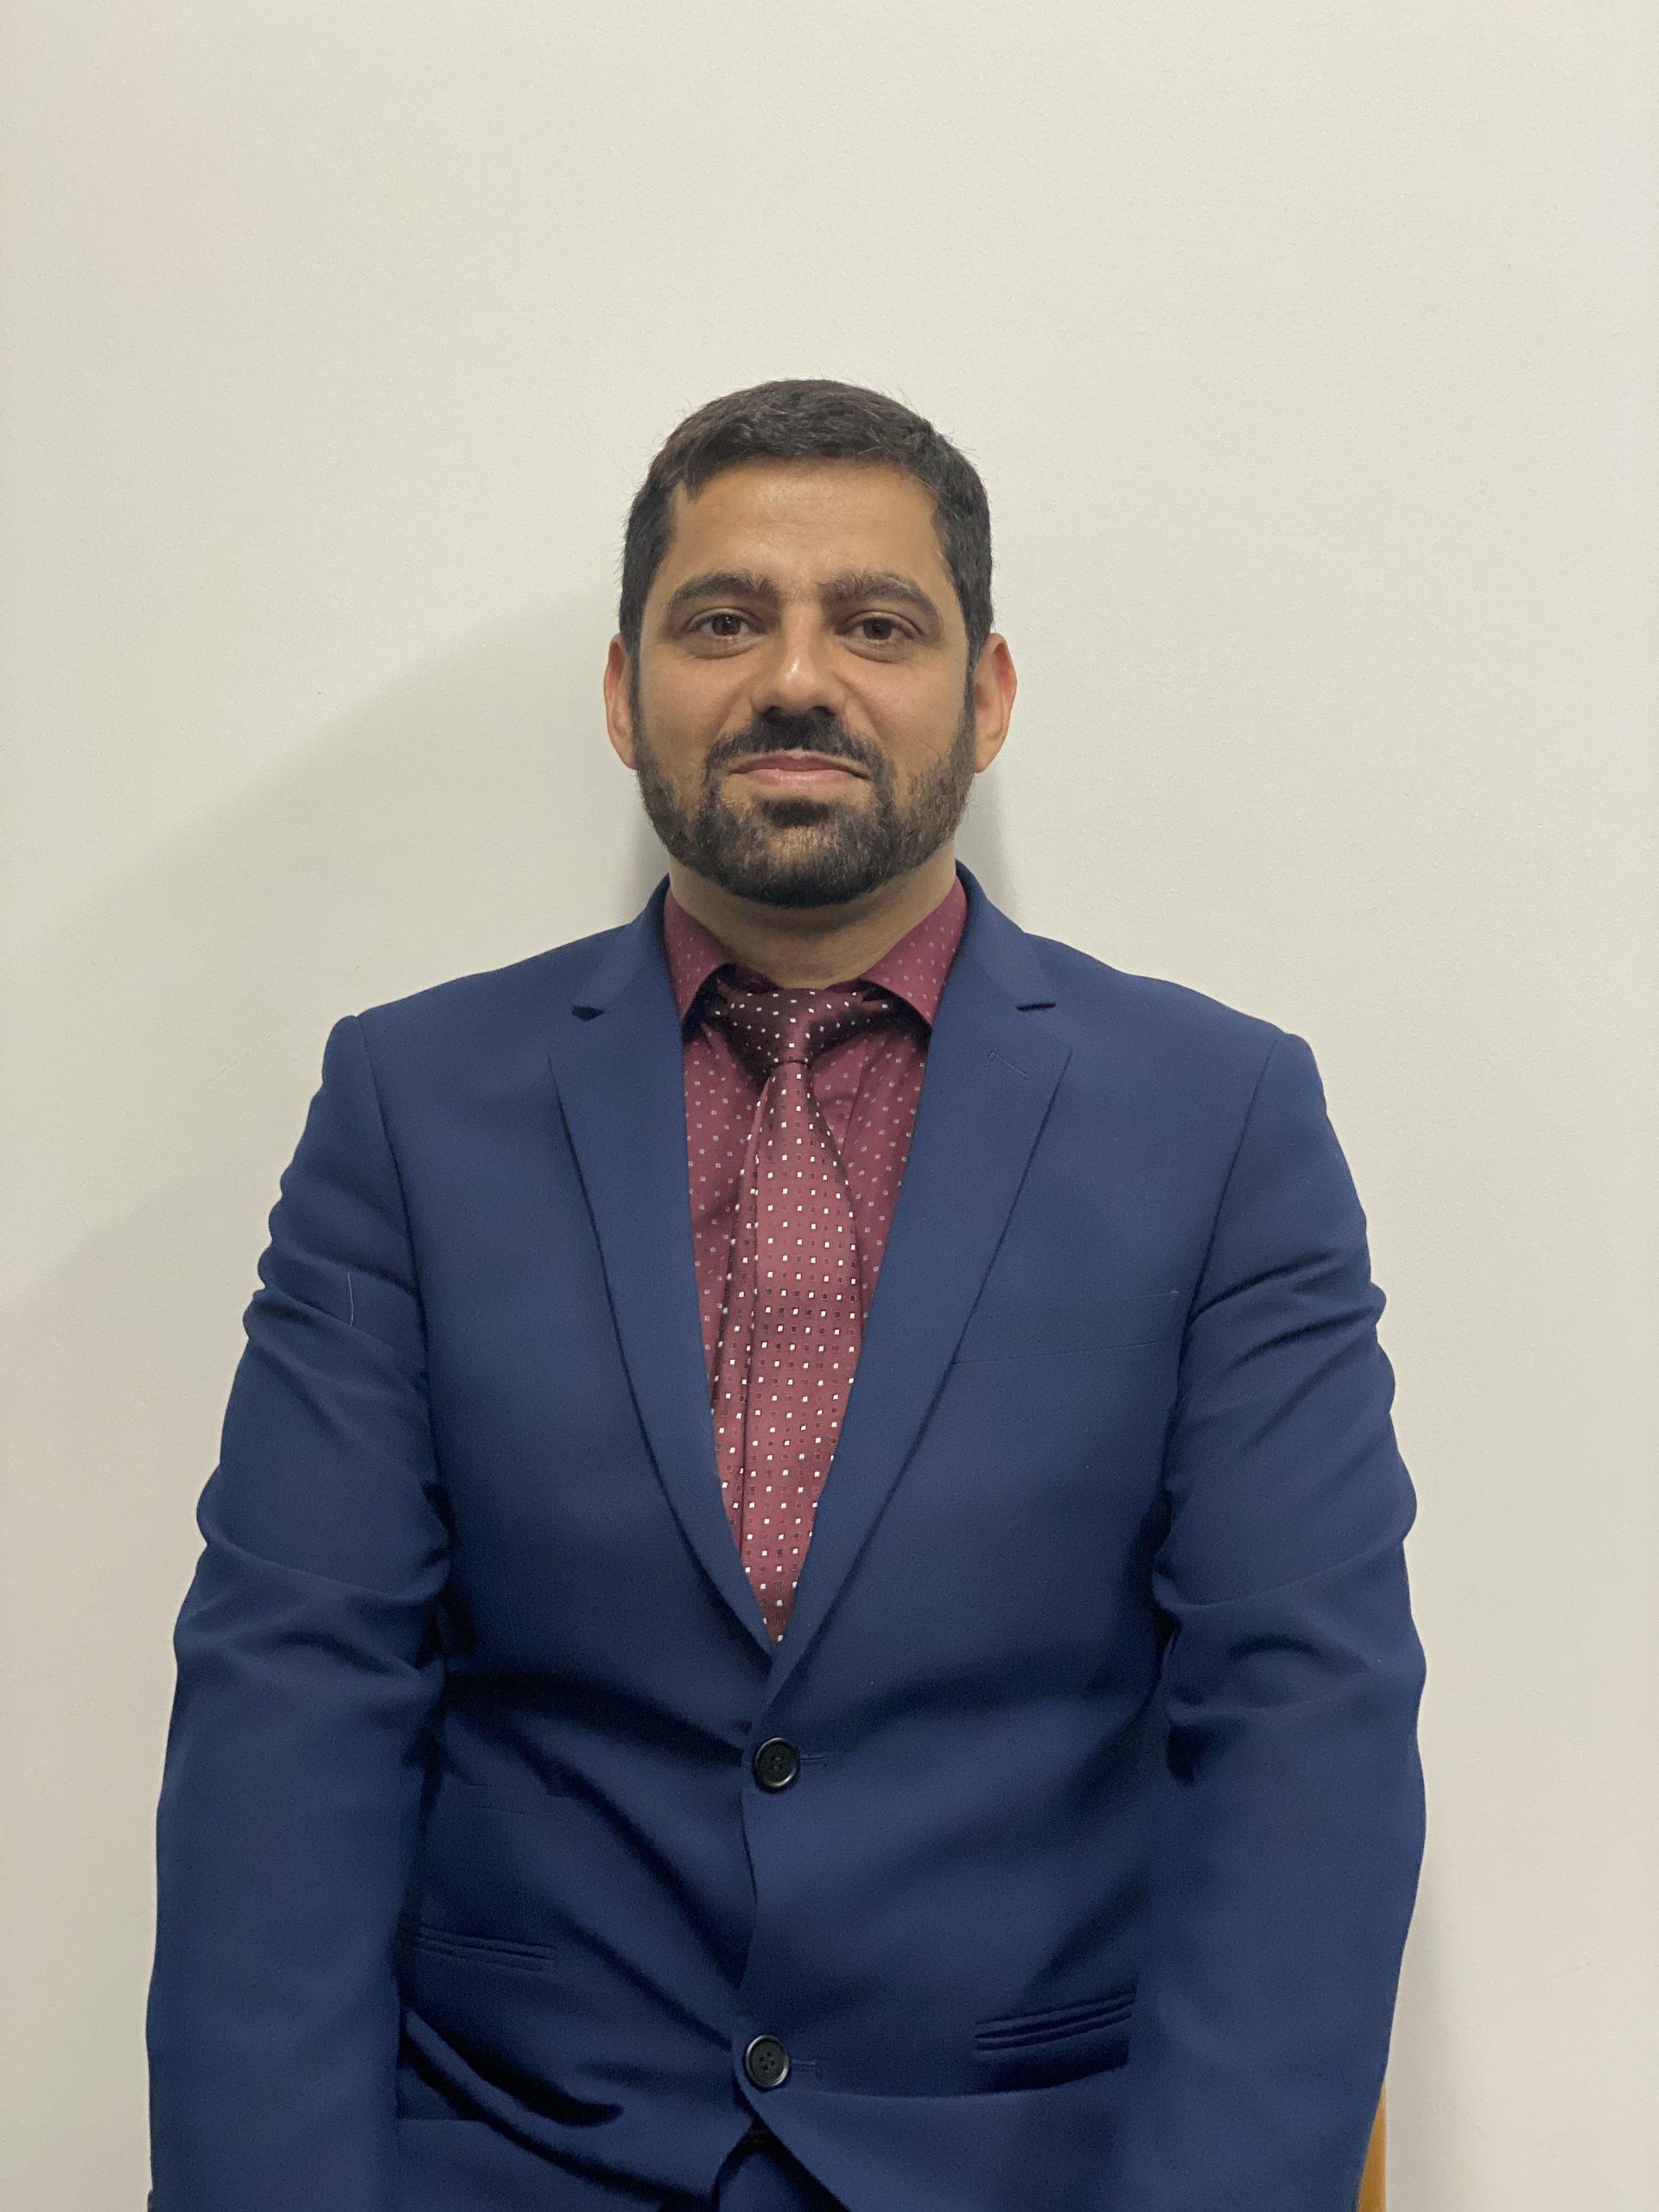 Mr Mohsin Mirza